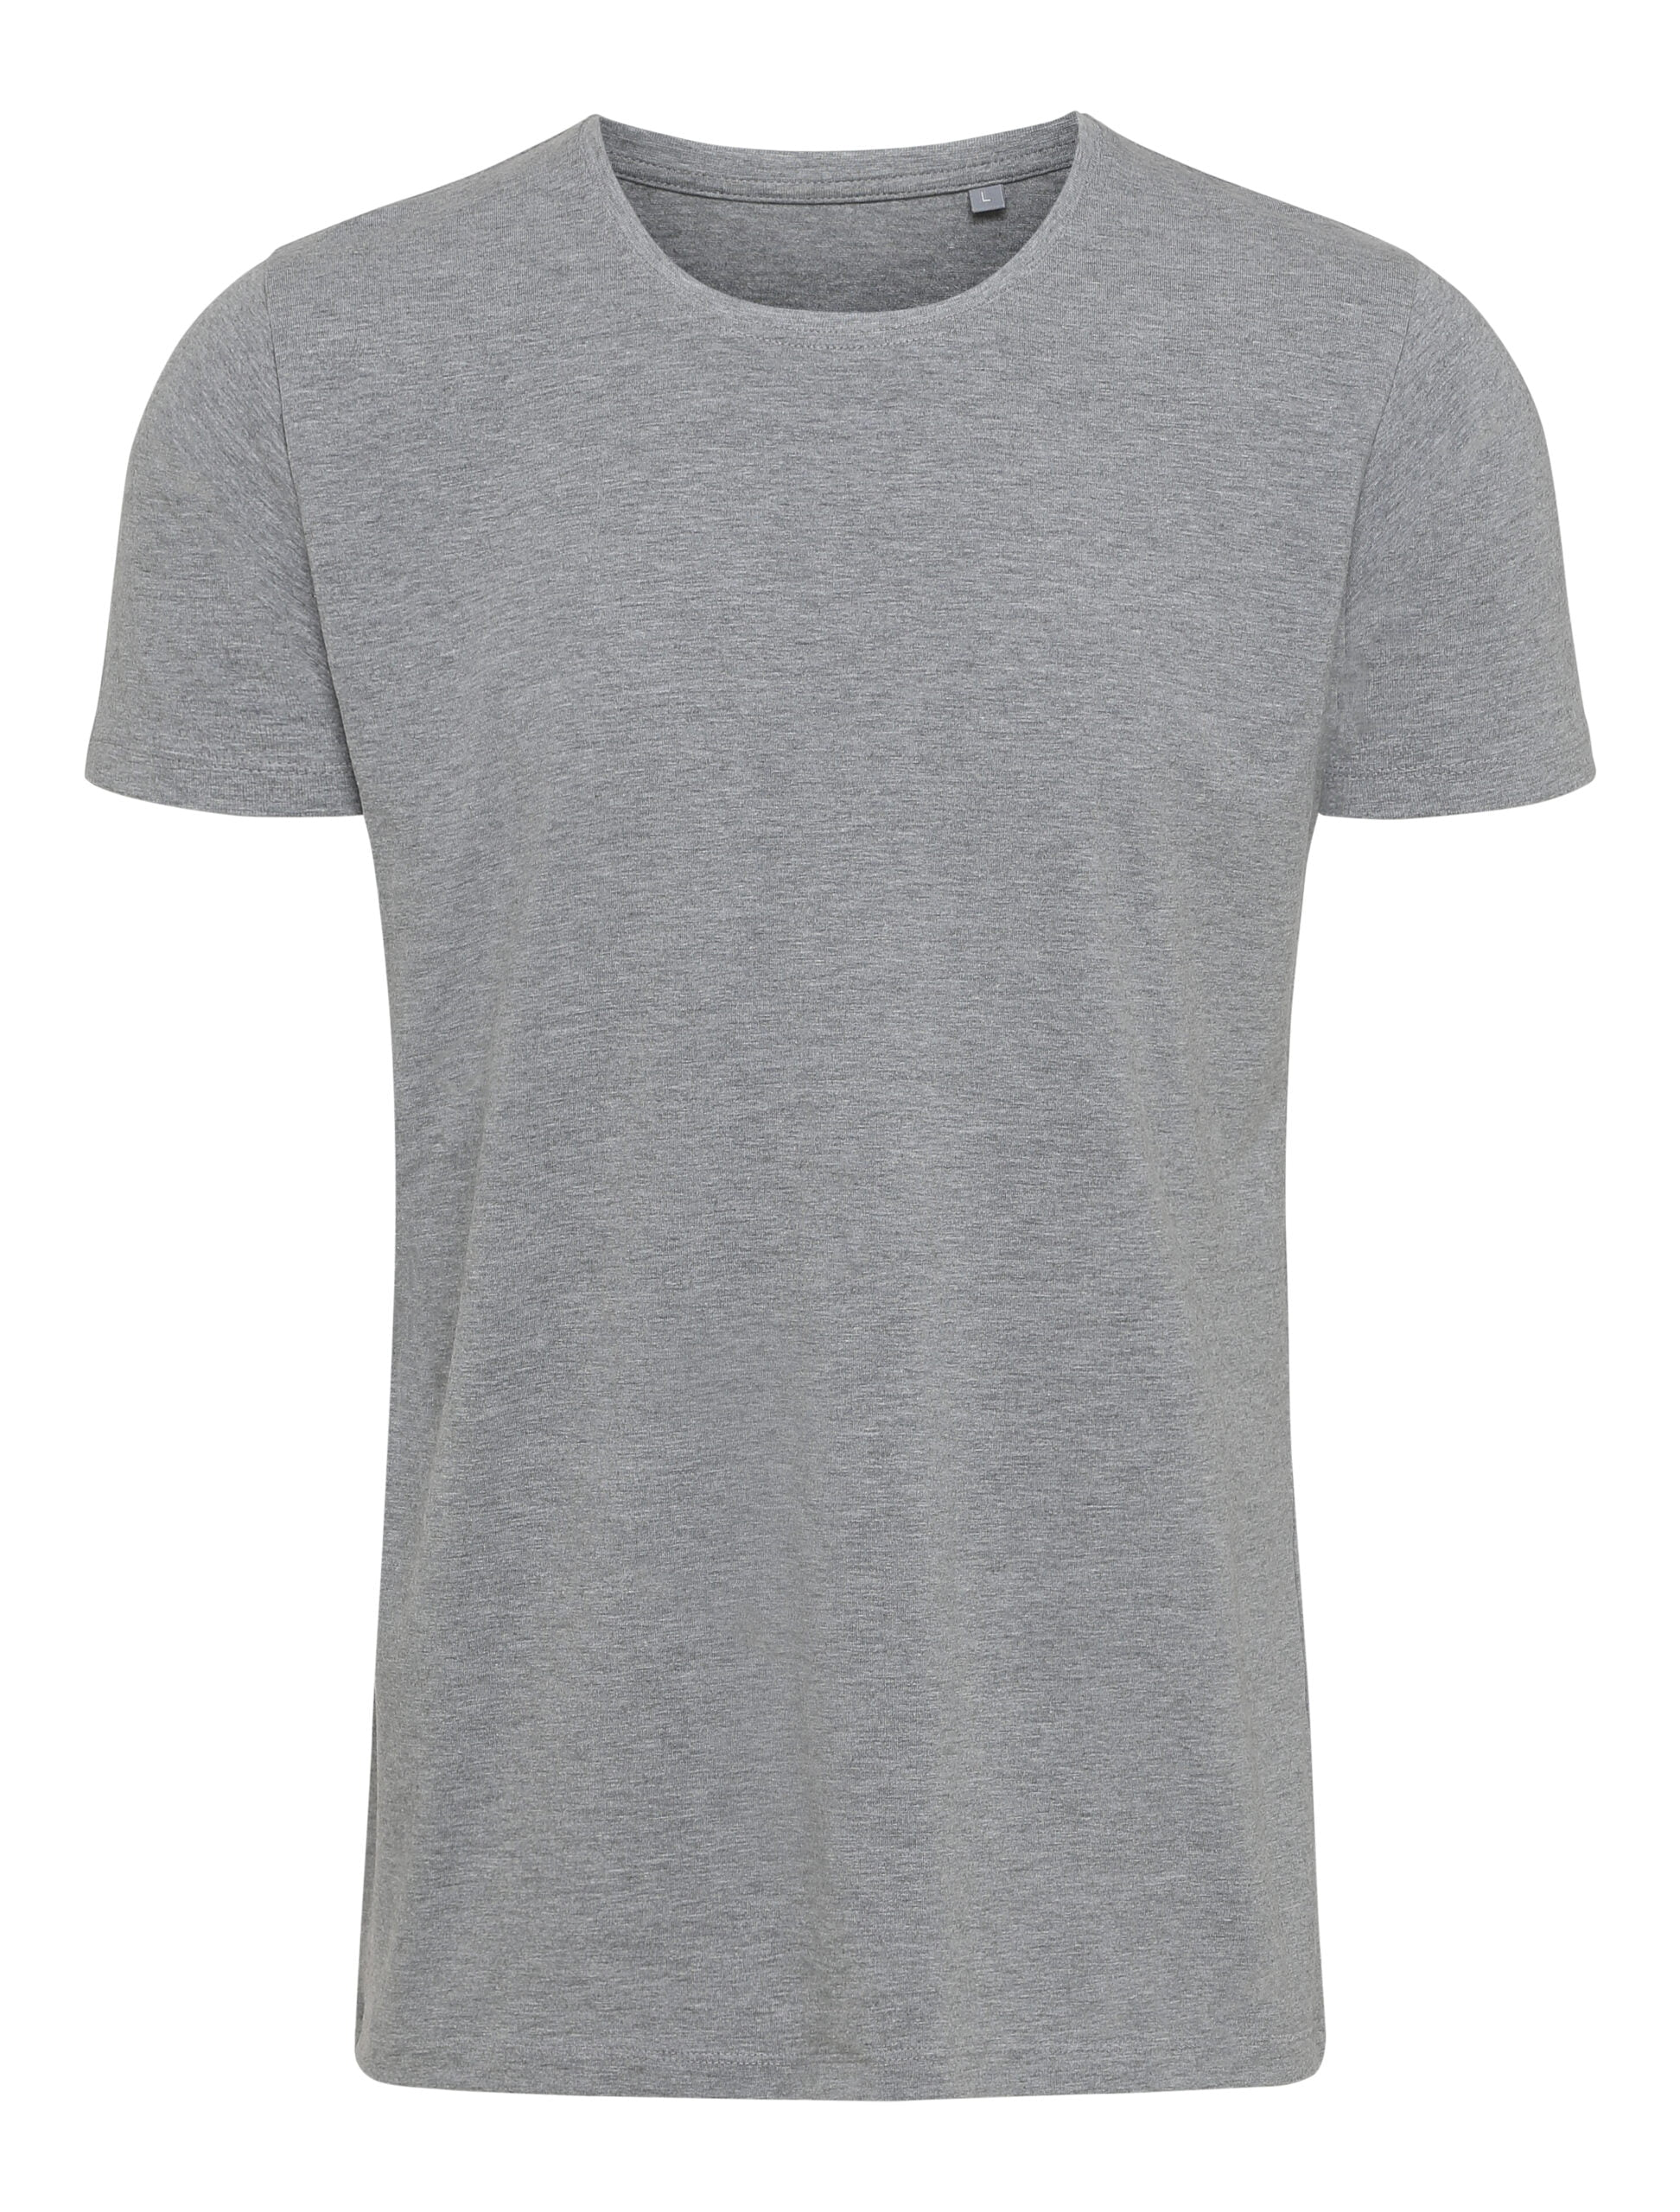 Premium Xtreme Stretch T-shirt Grå